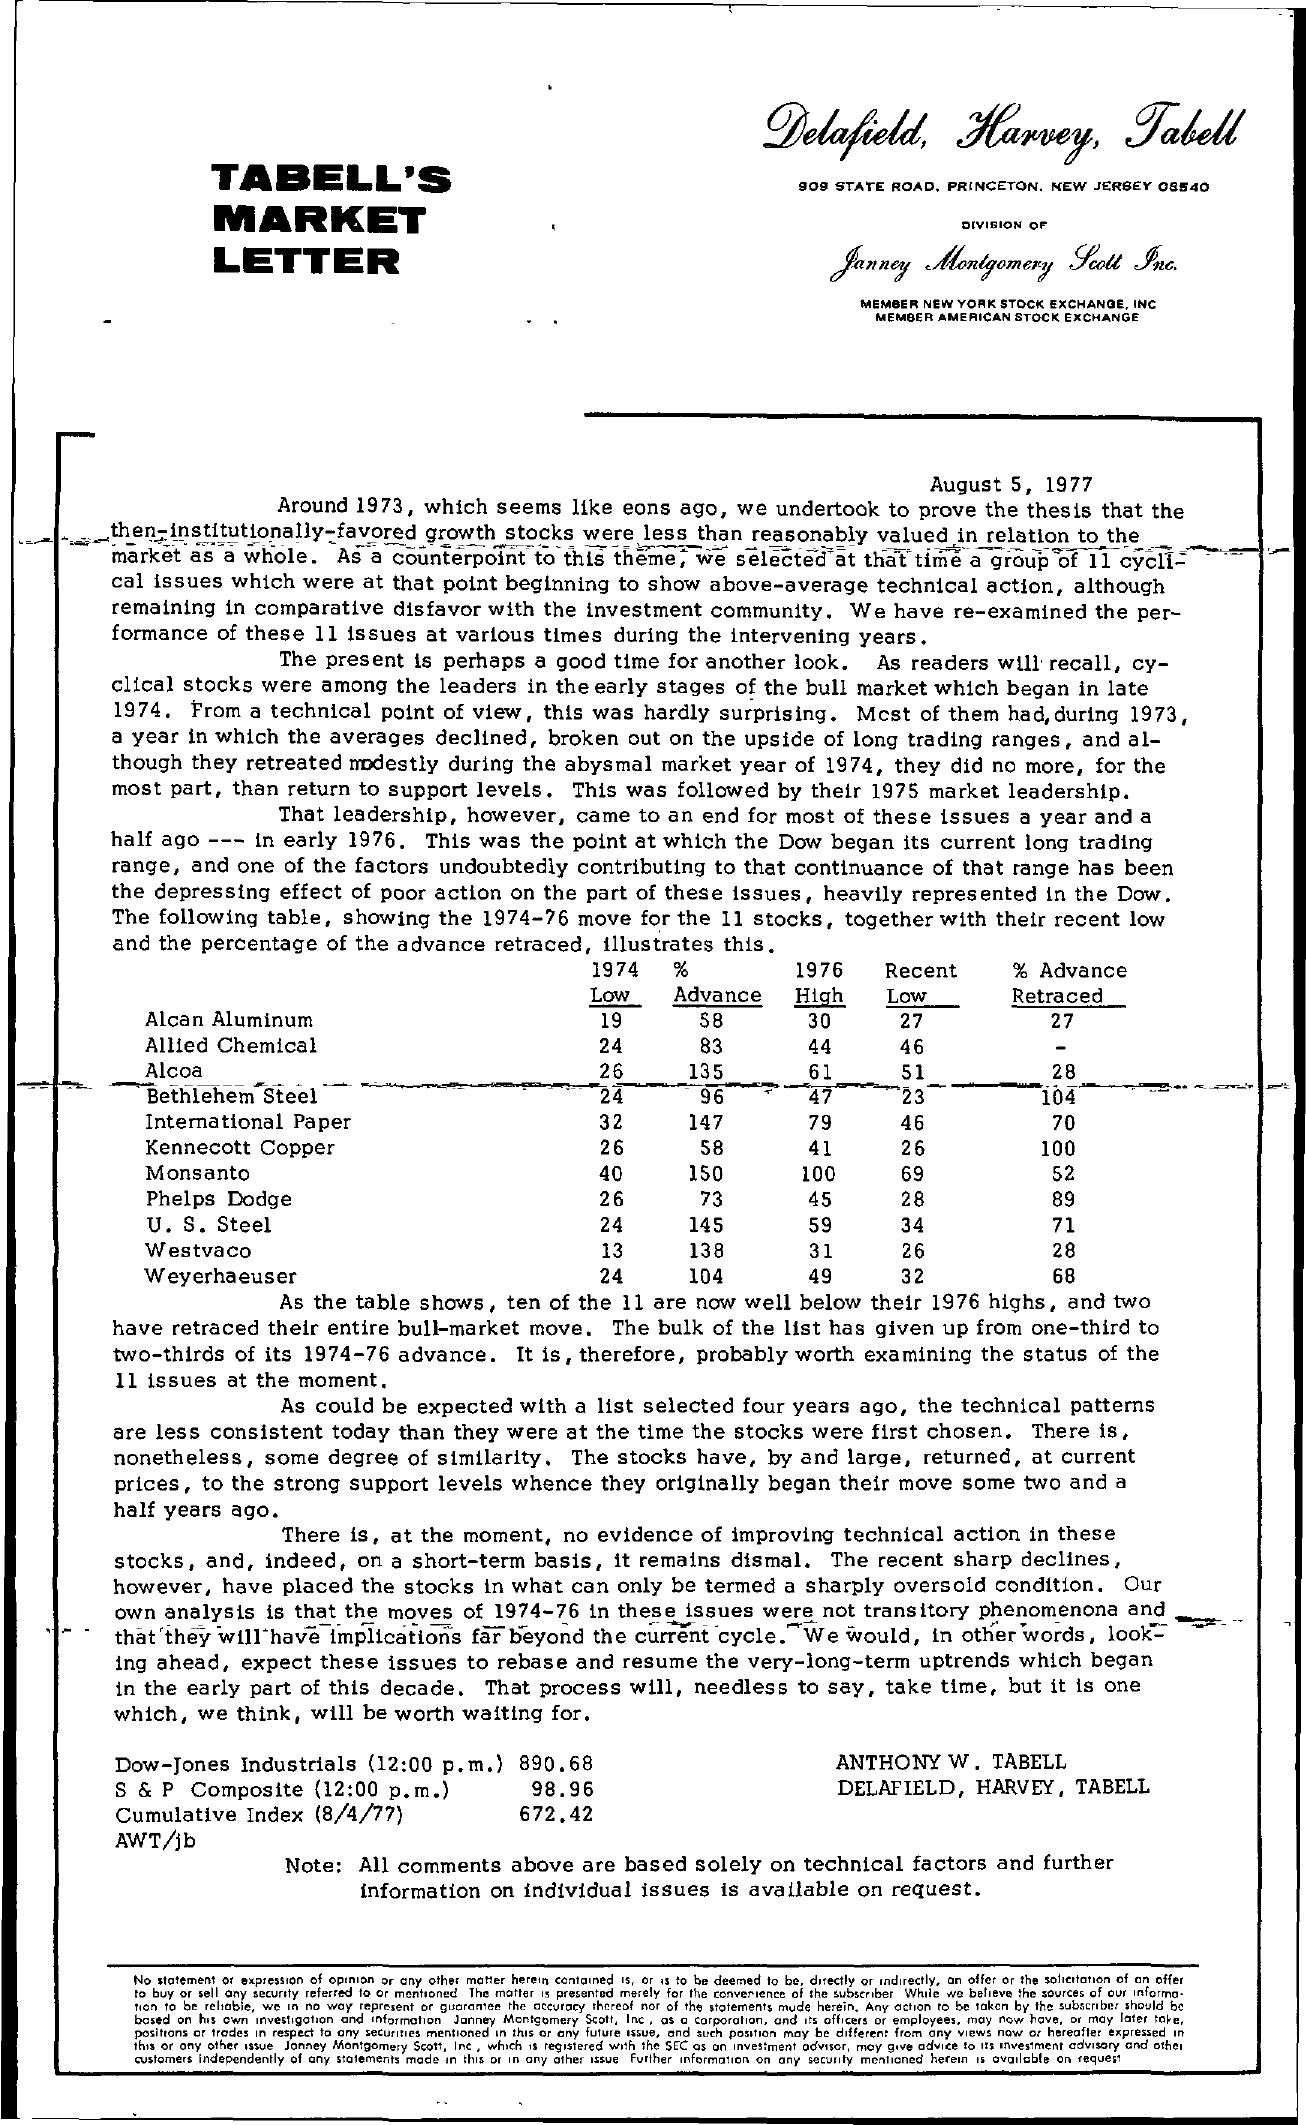 Tabell's Market Letter - August 05, 1977